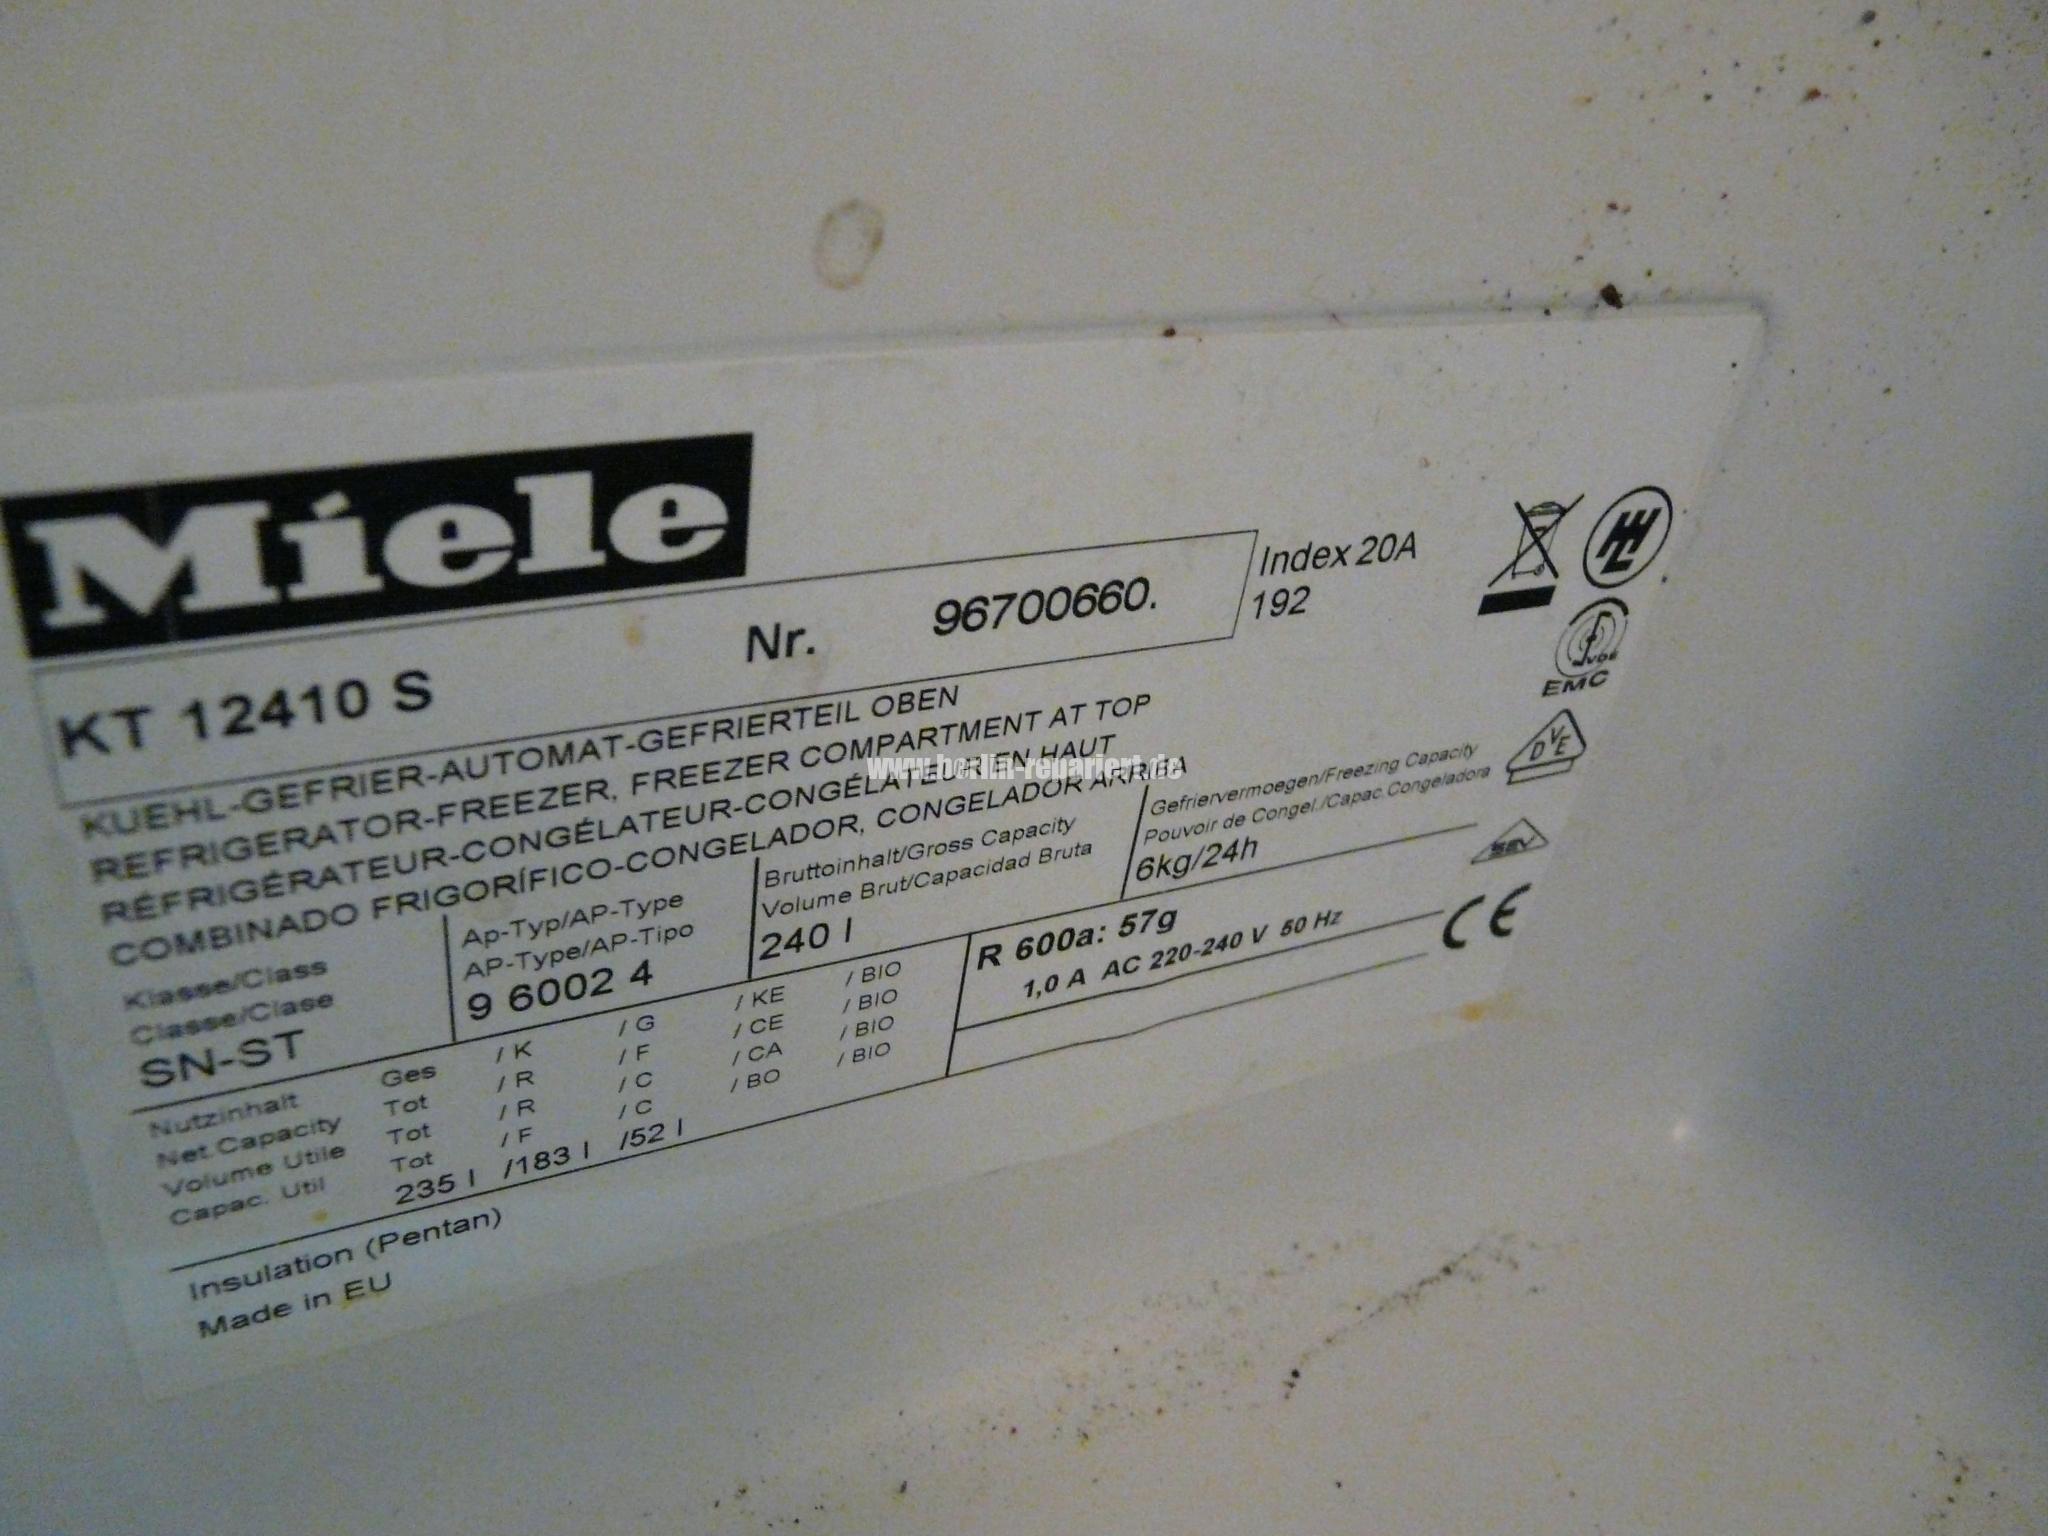 Bosch Kühlschrank Lampe Geht Nicht Aus : Miele kt 12410s kühlt nicht die lampe geht nicht aus soll entsorgt